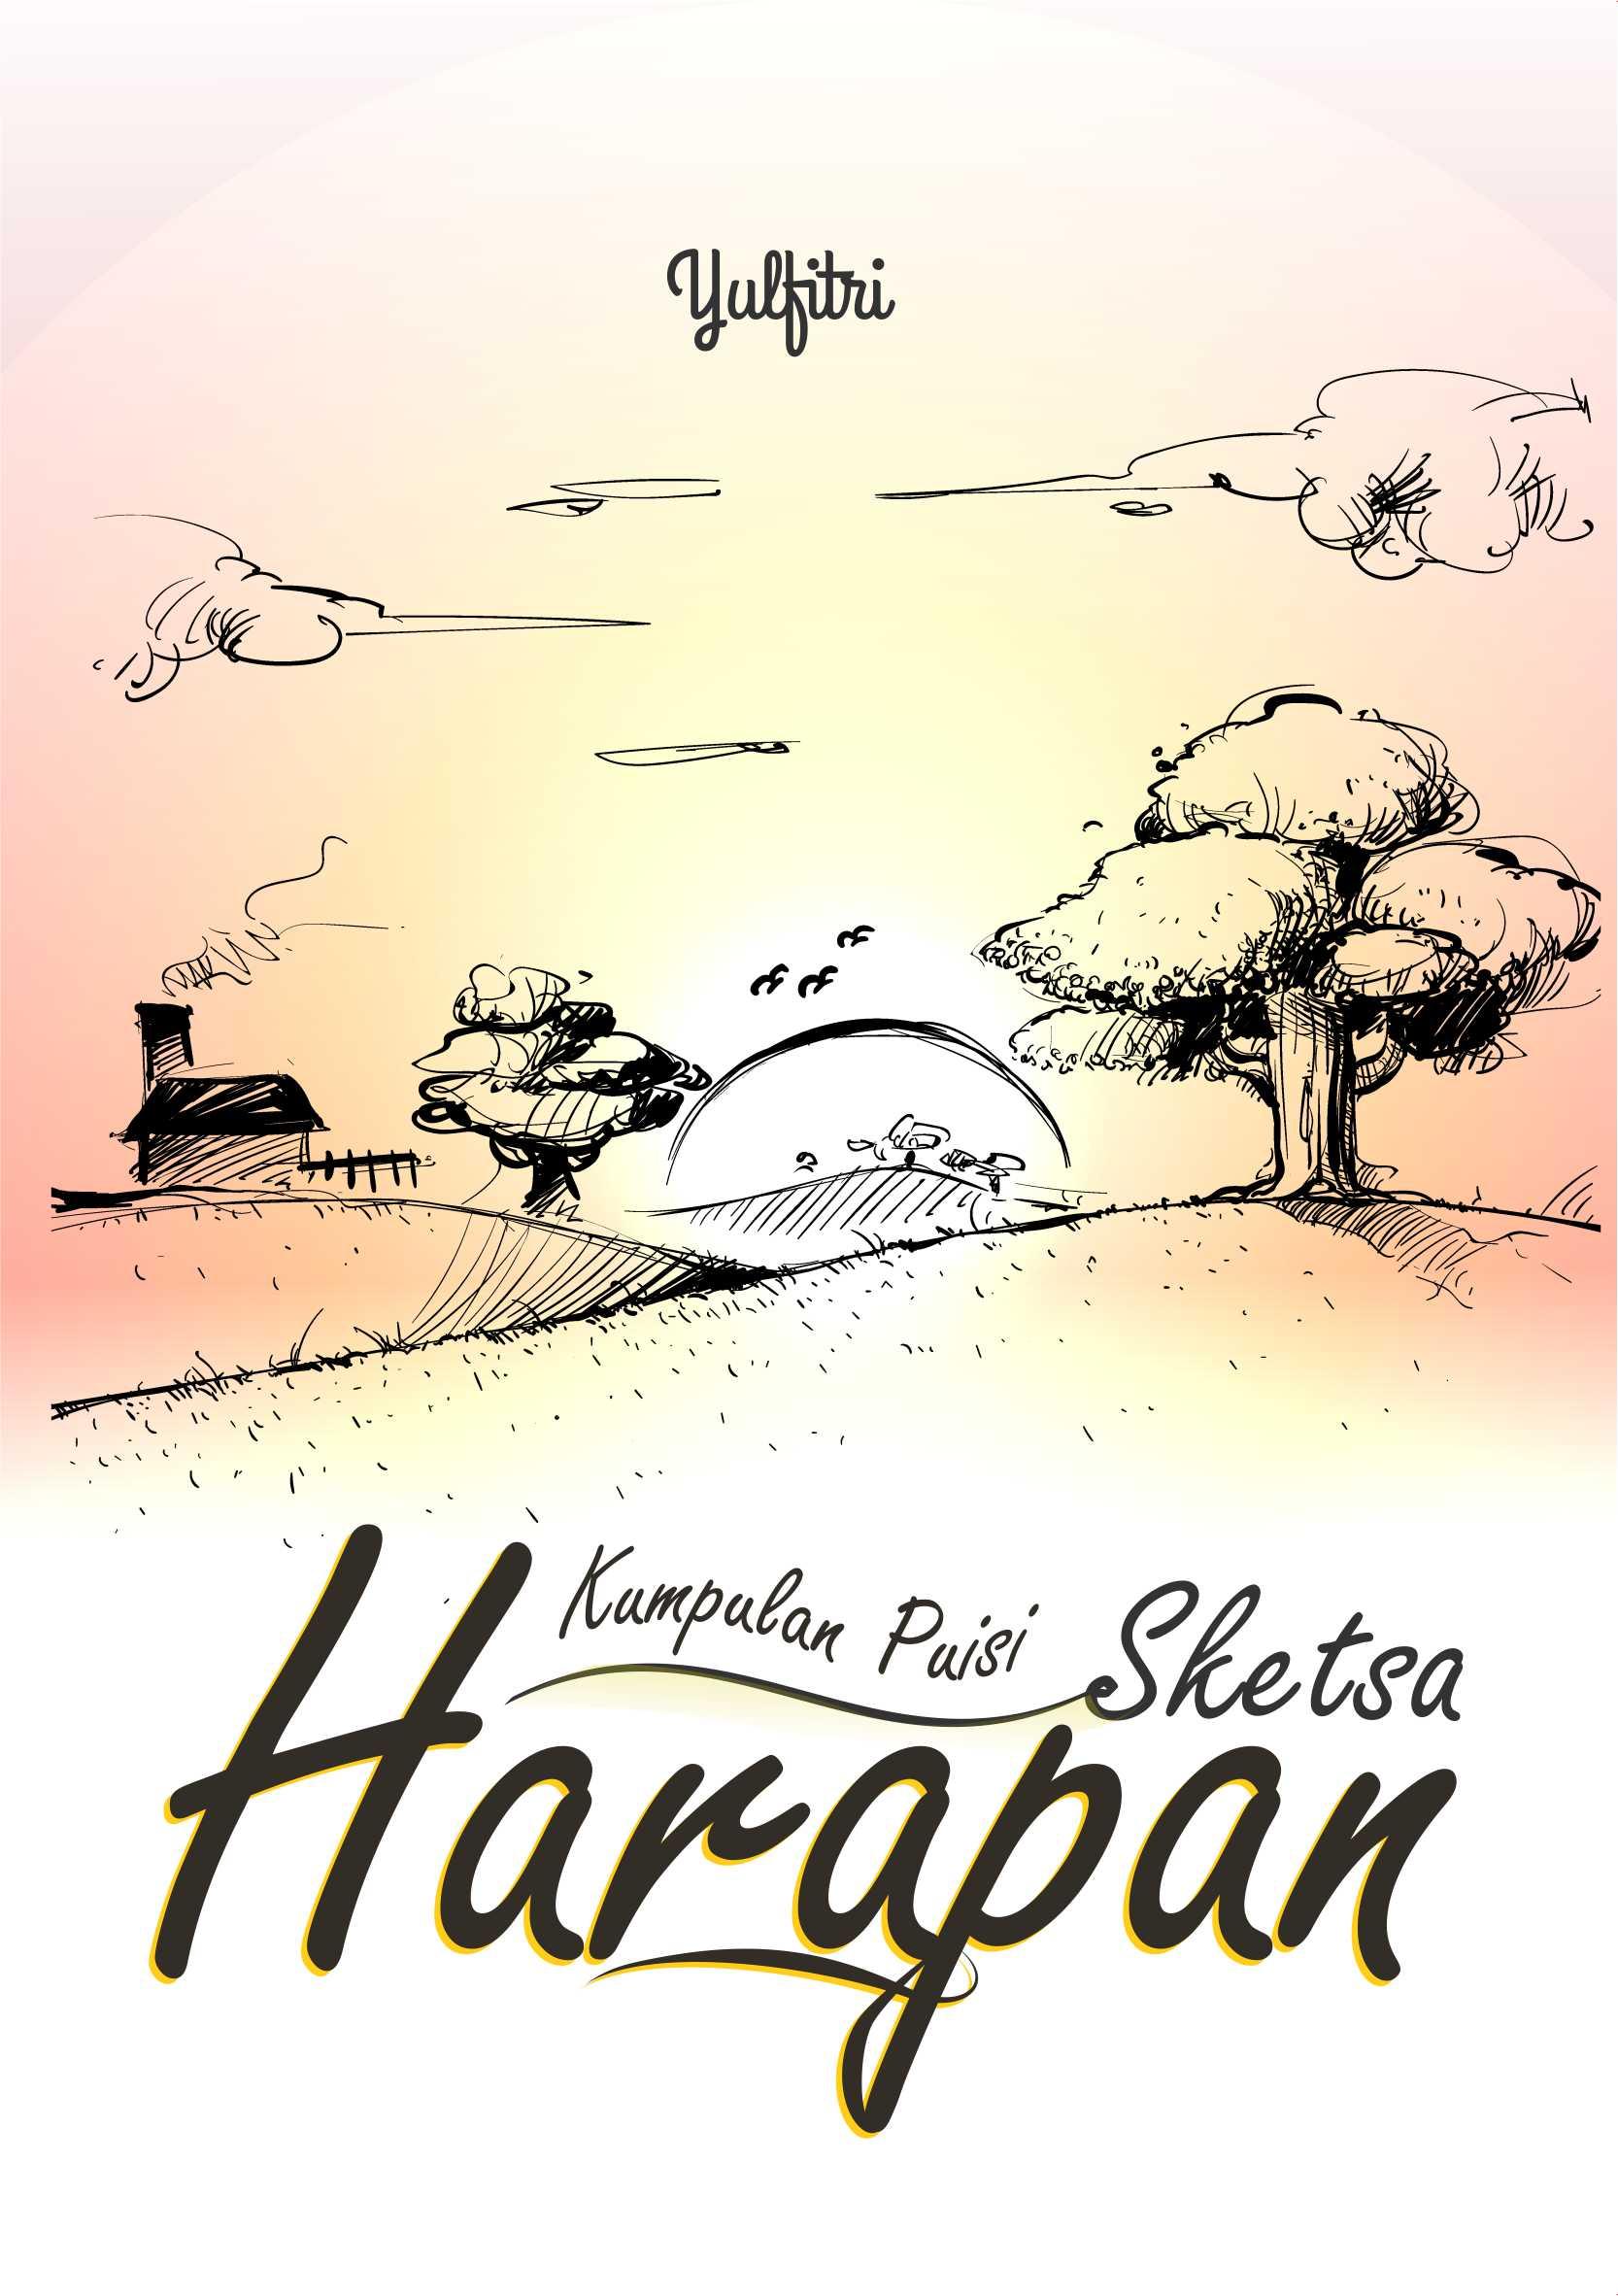 Kumpulan puisi sketsa harapan [sumber elektronis]